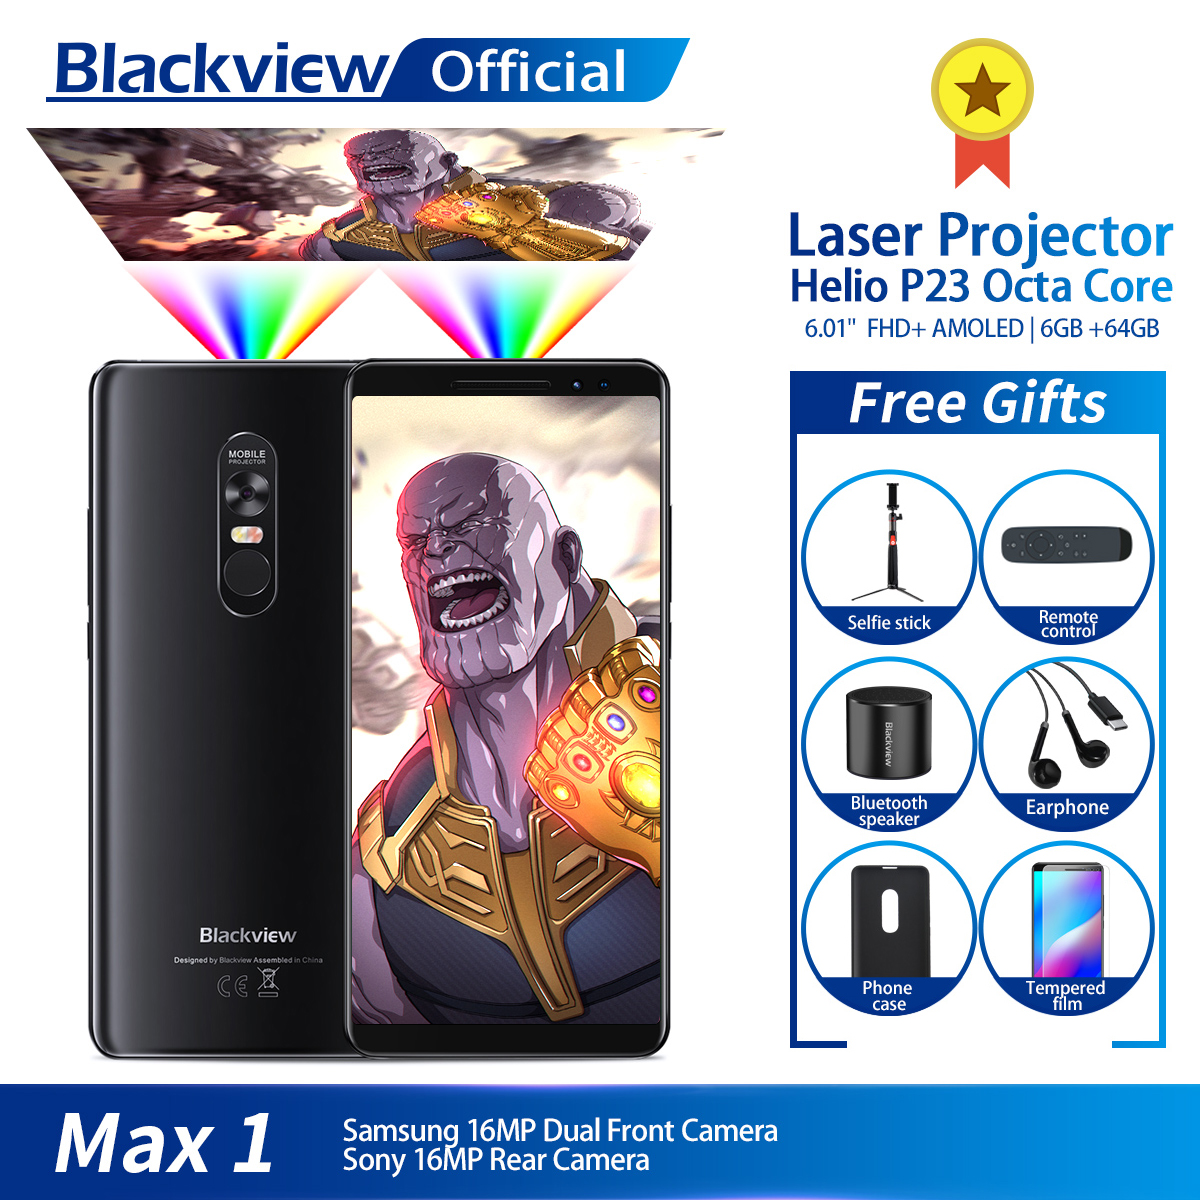 Blackview Max 1 Draadloze Projector Mobiele Telefoon 6.01 Amoled 4680 Mah Android 8.1 6 Gb + 64 Gb Home Theater Projectoren Smartphone Noch Te Hard Noch Te Zacht